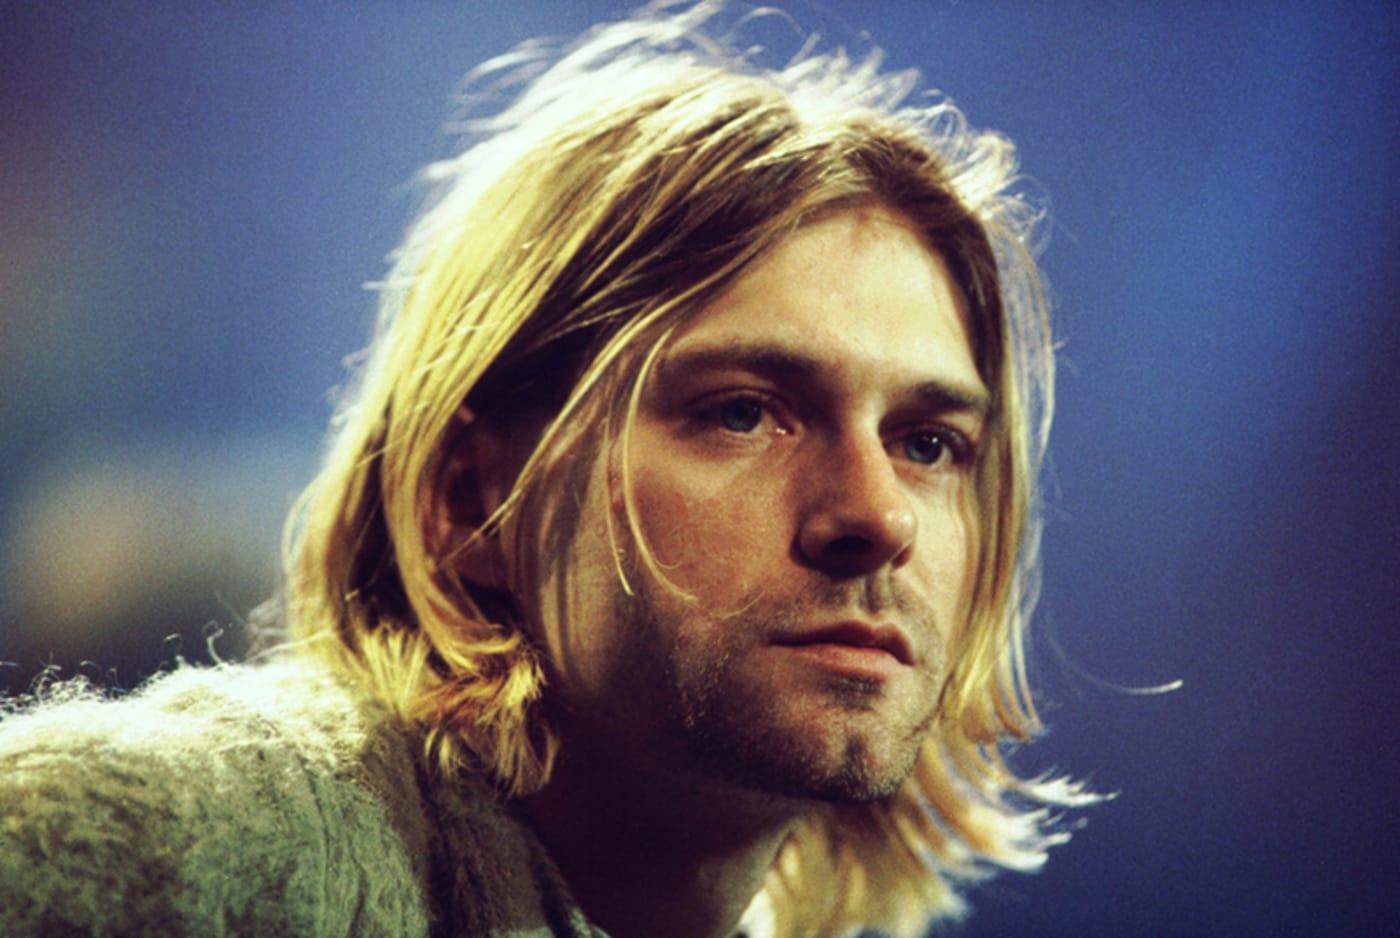 kurt cobain getty unplugged frank micelotta